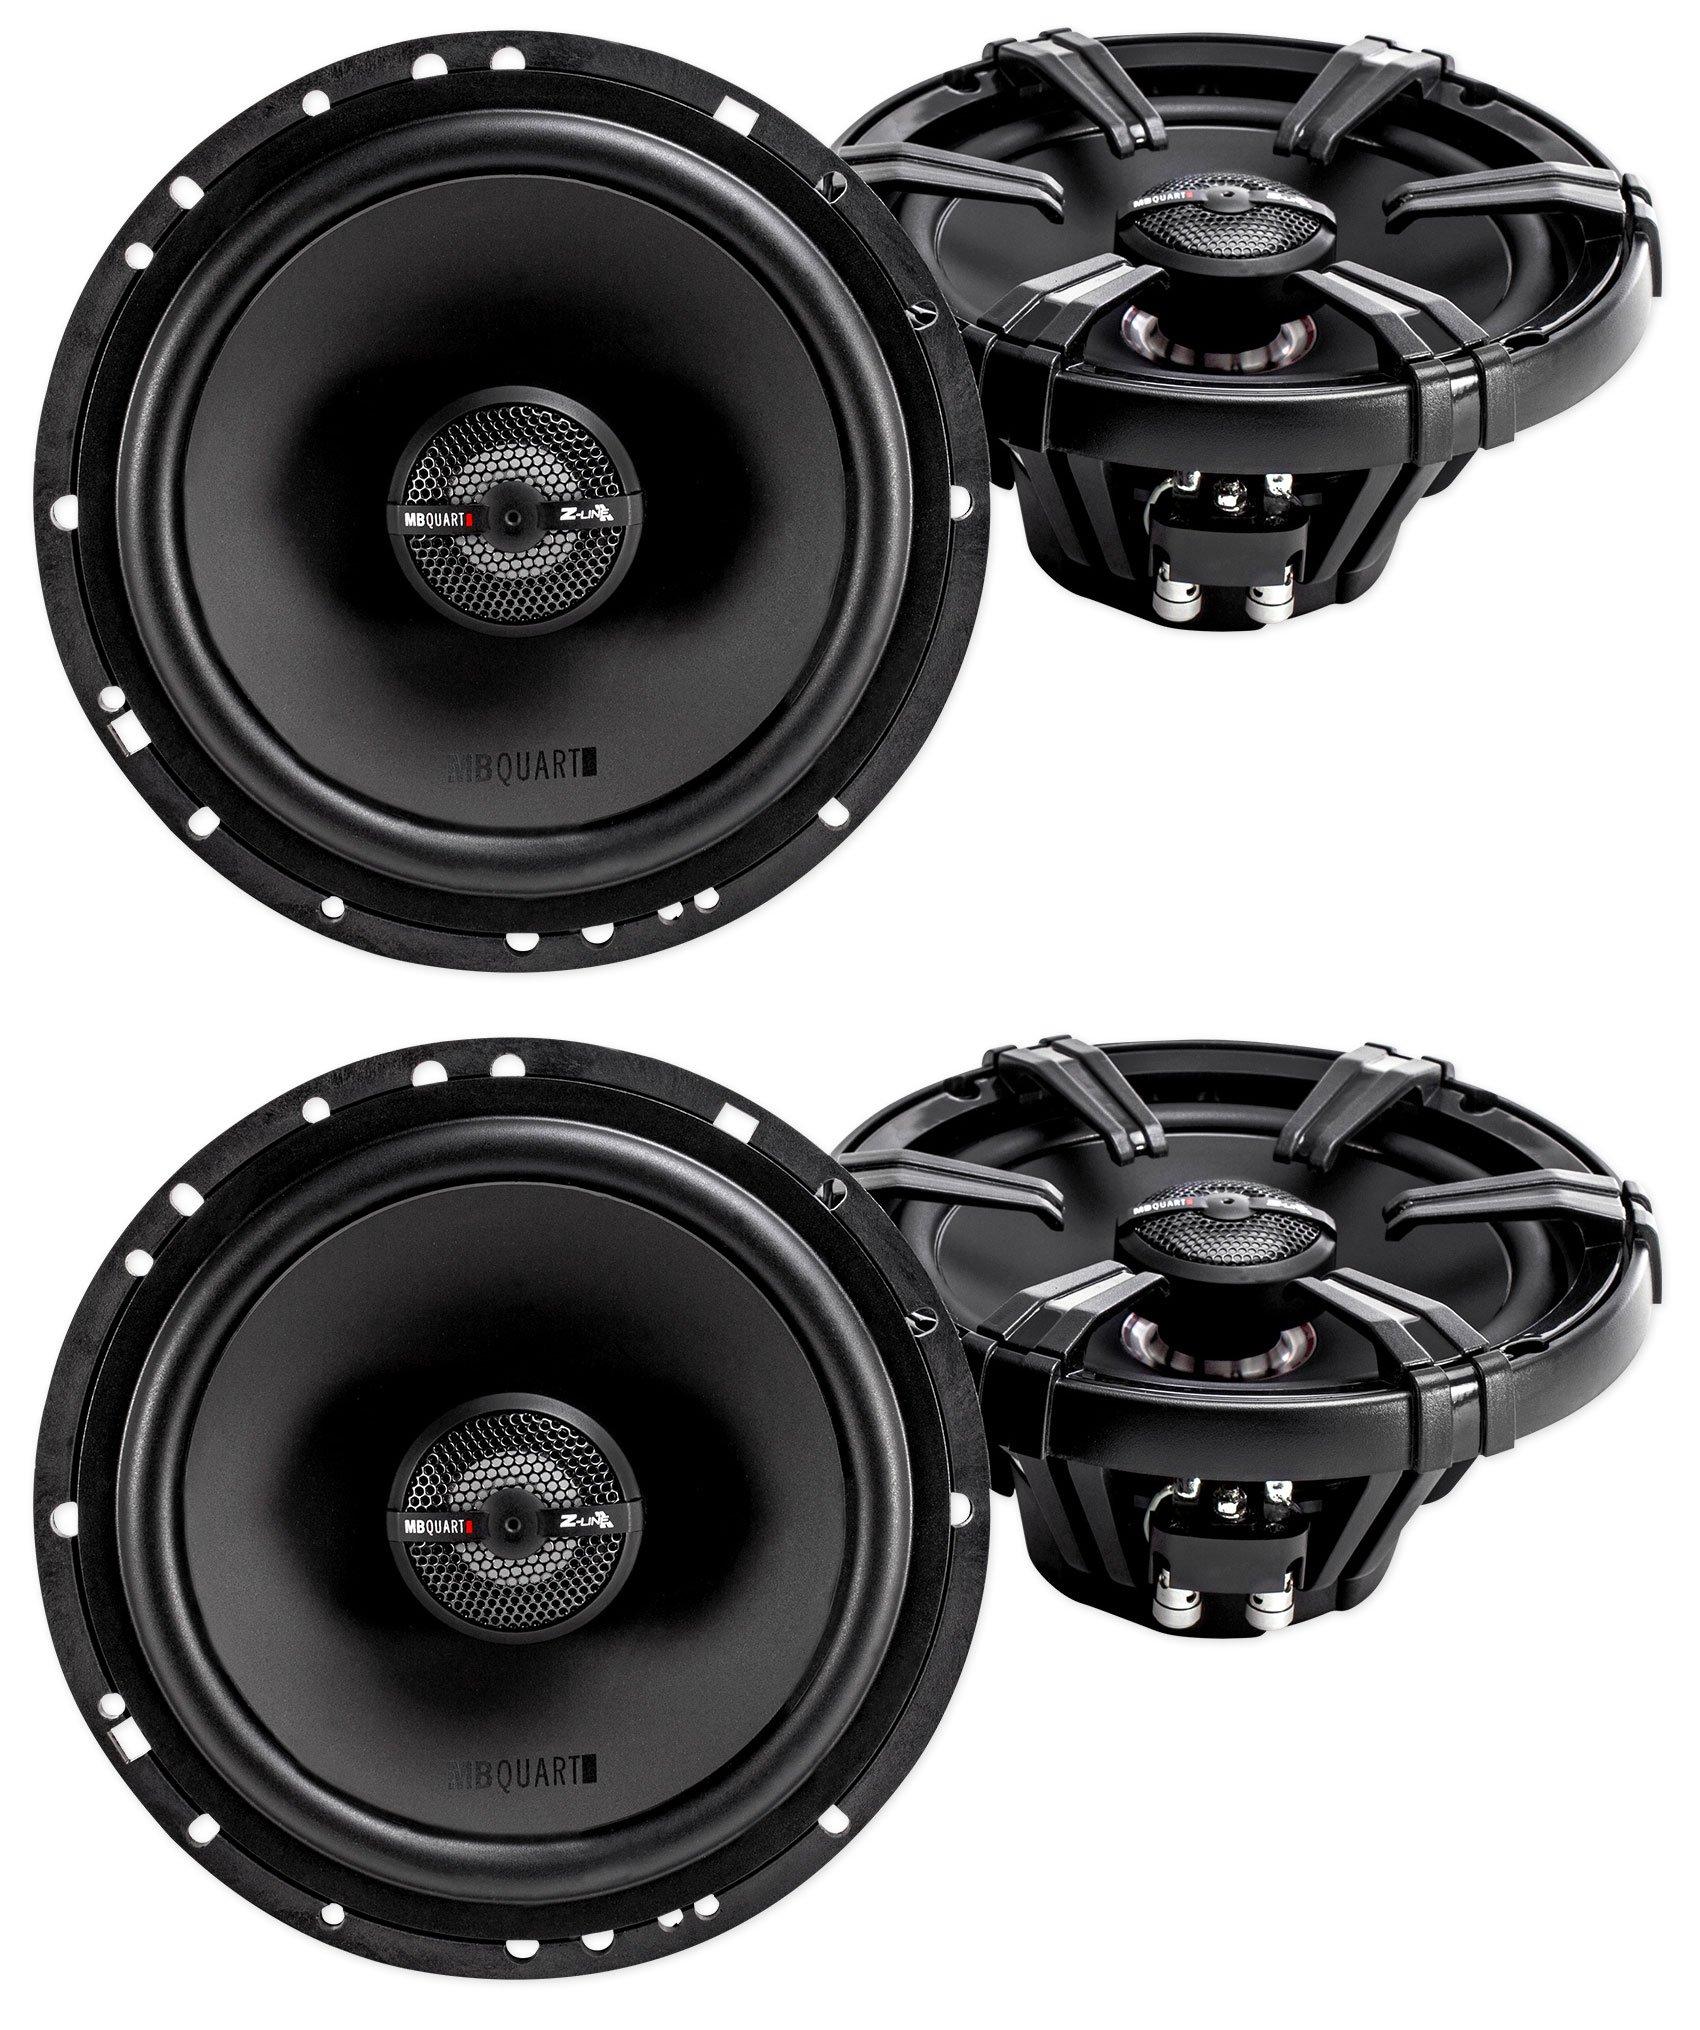 (4) MB Quart ZK1-116 6.5'' 480 Watt Car Audio Speakers w/Ceramic Coated Tweeters